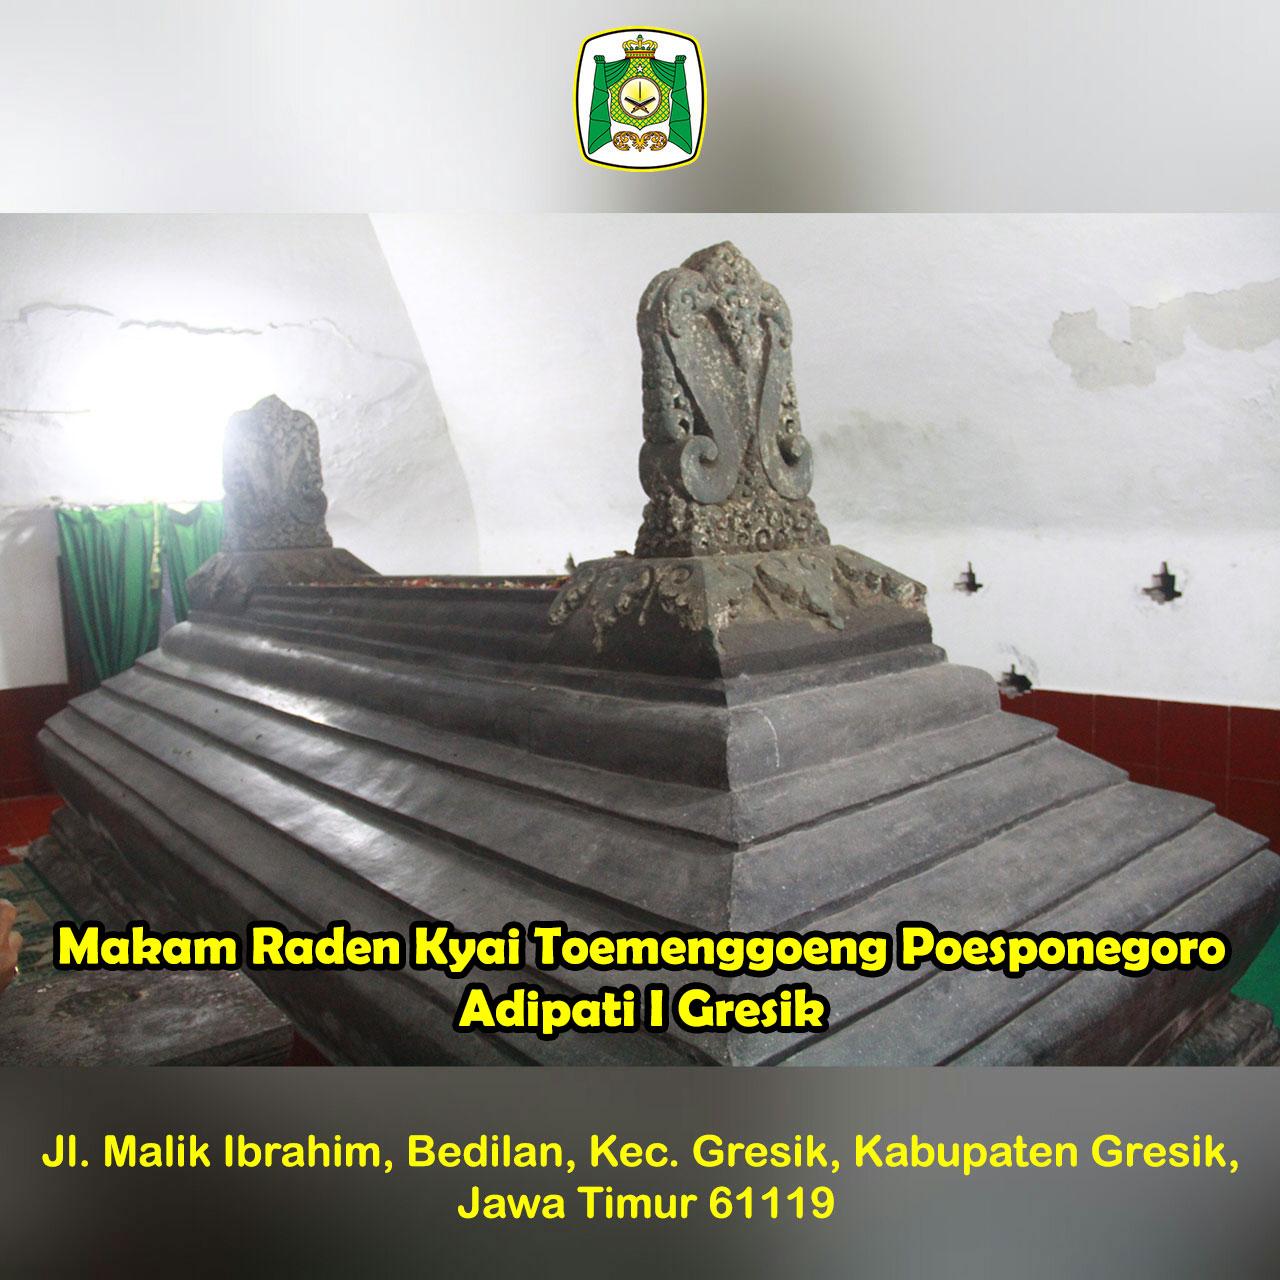 Raden Kyai Tumenggung Poesponegoro Almunawwarah Trans Makam Adipati Gresik Situs